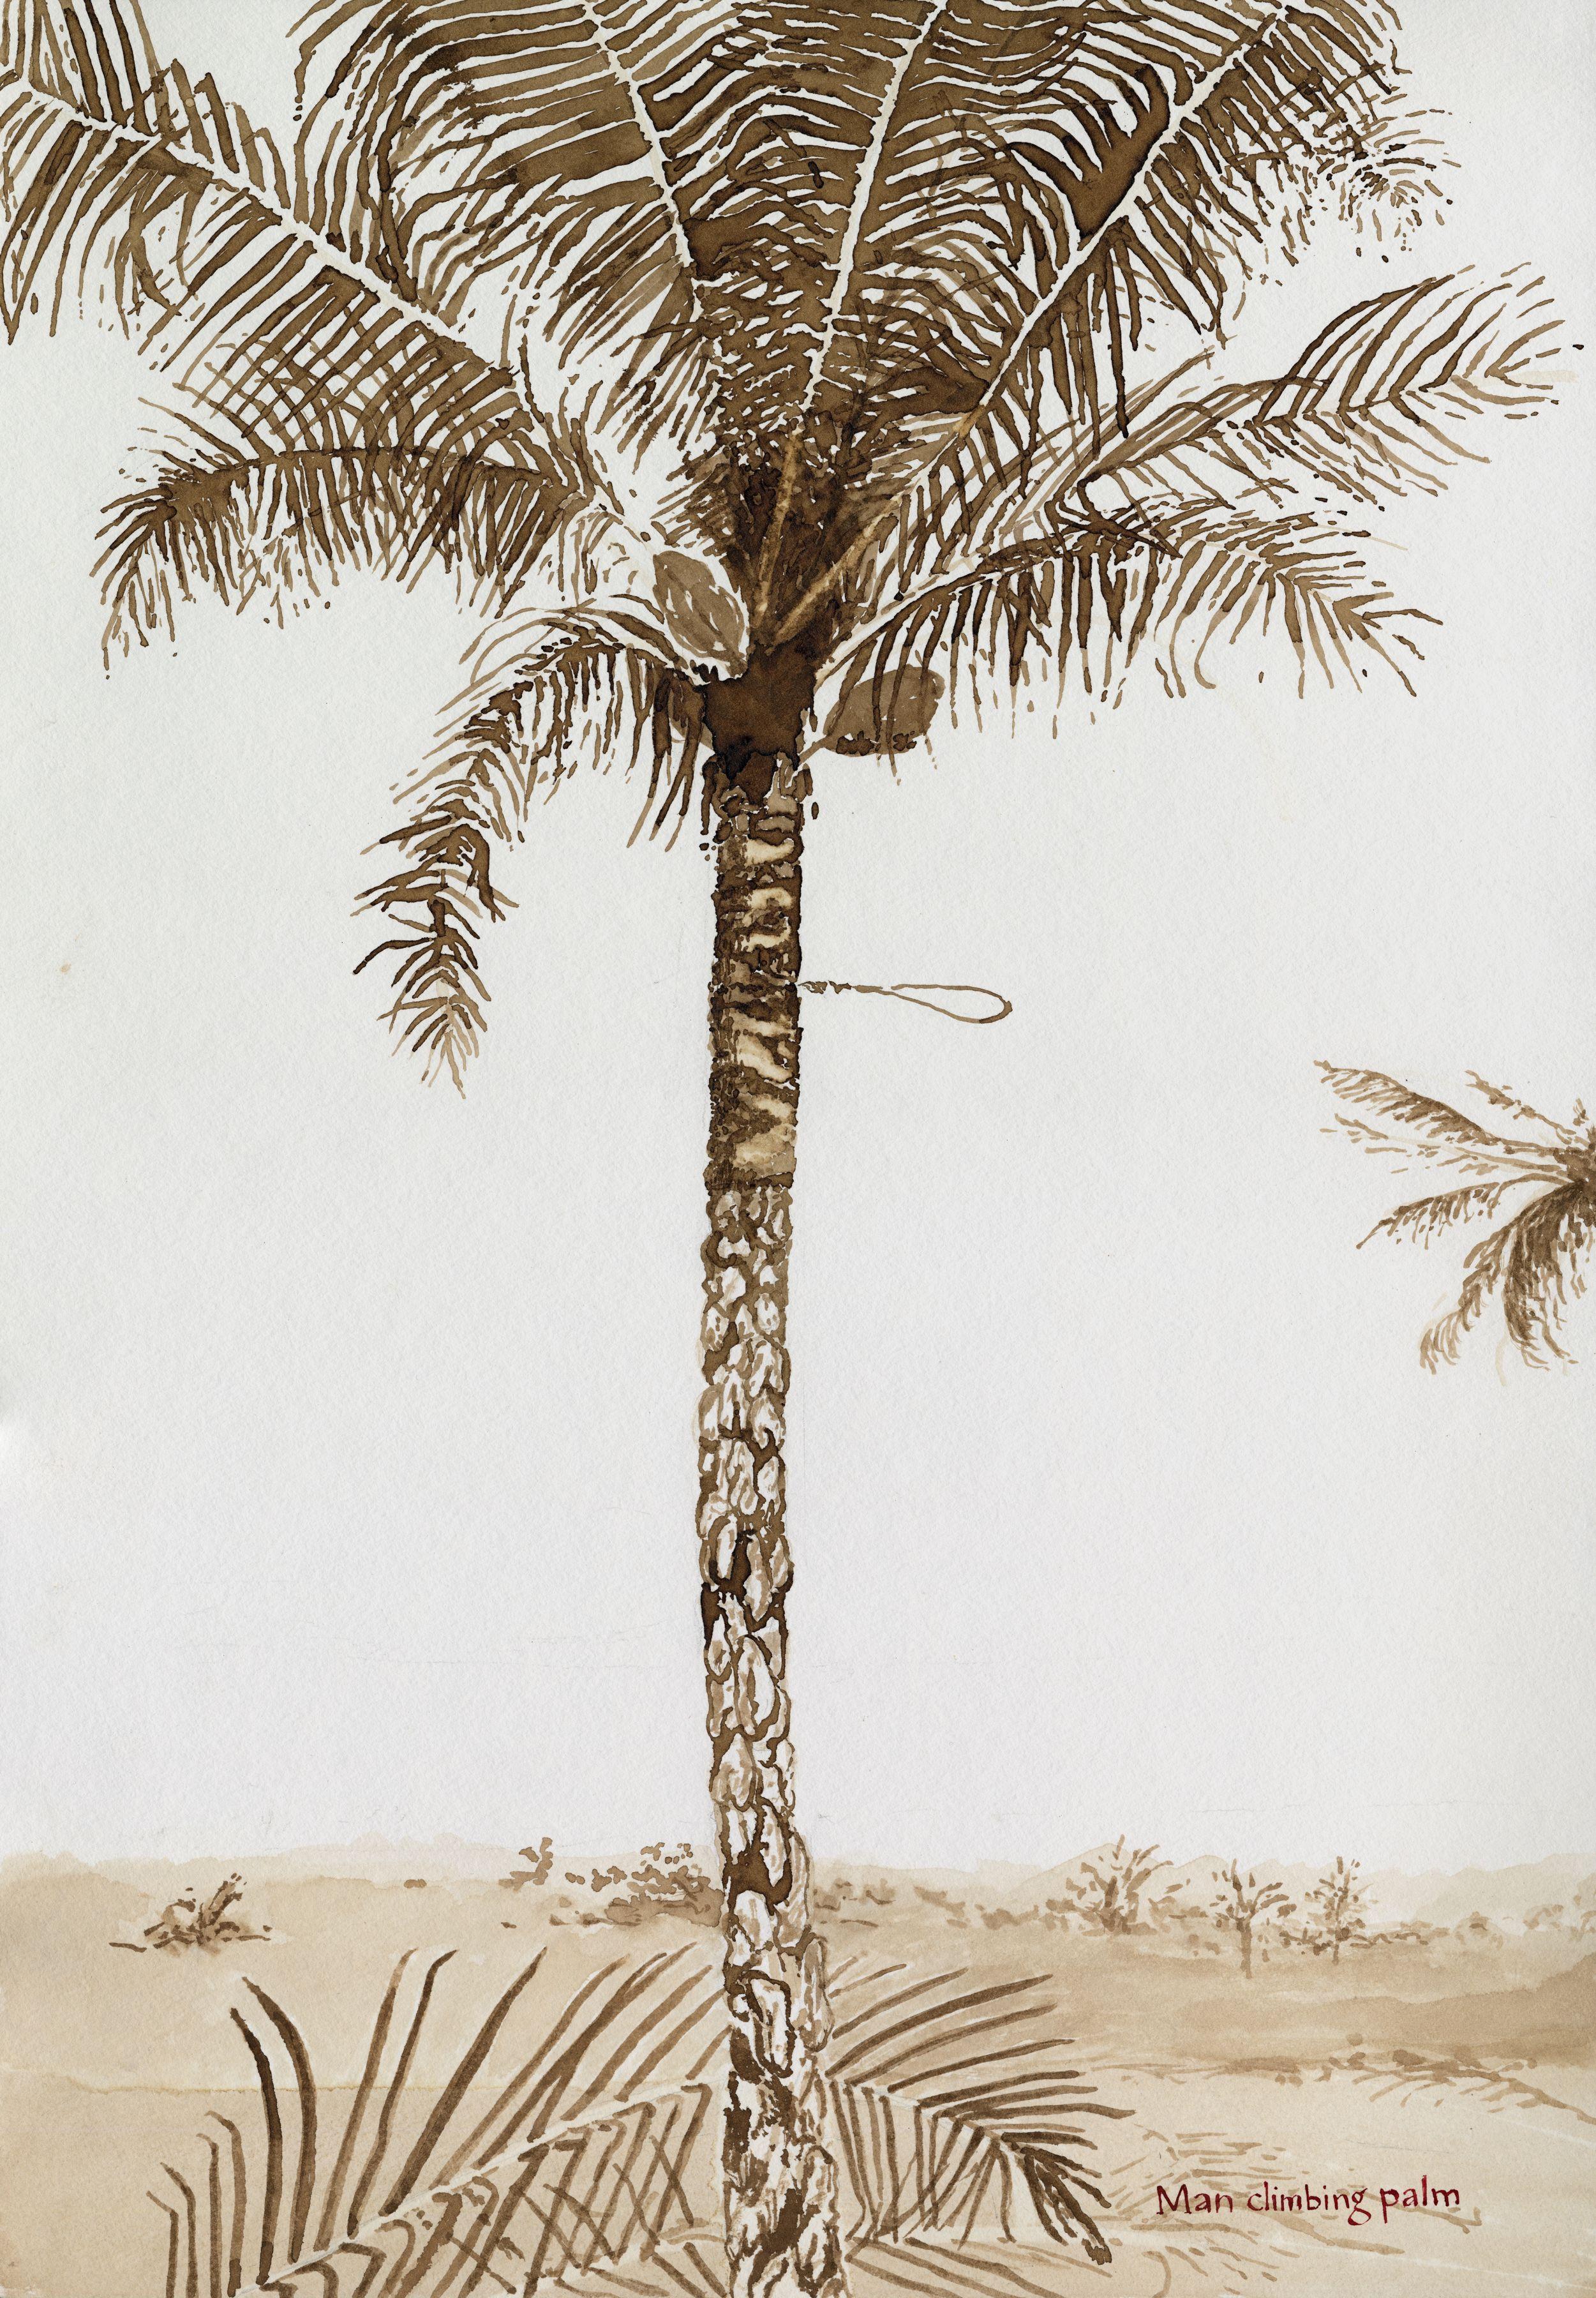 man climbing palm artwork